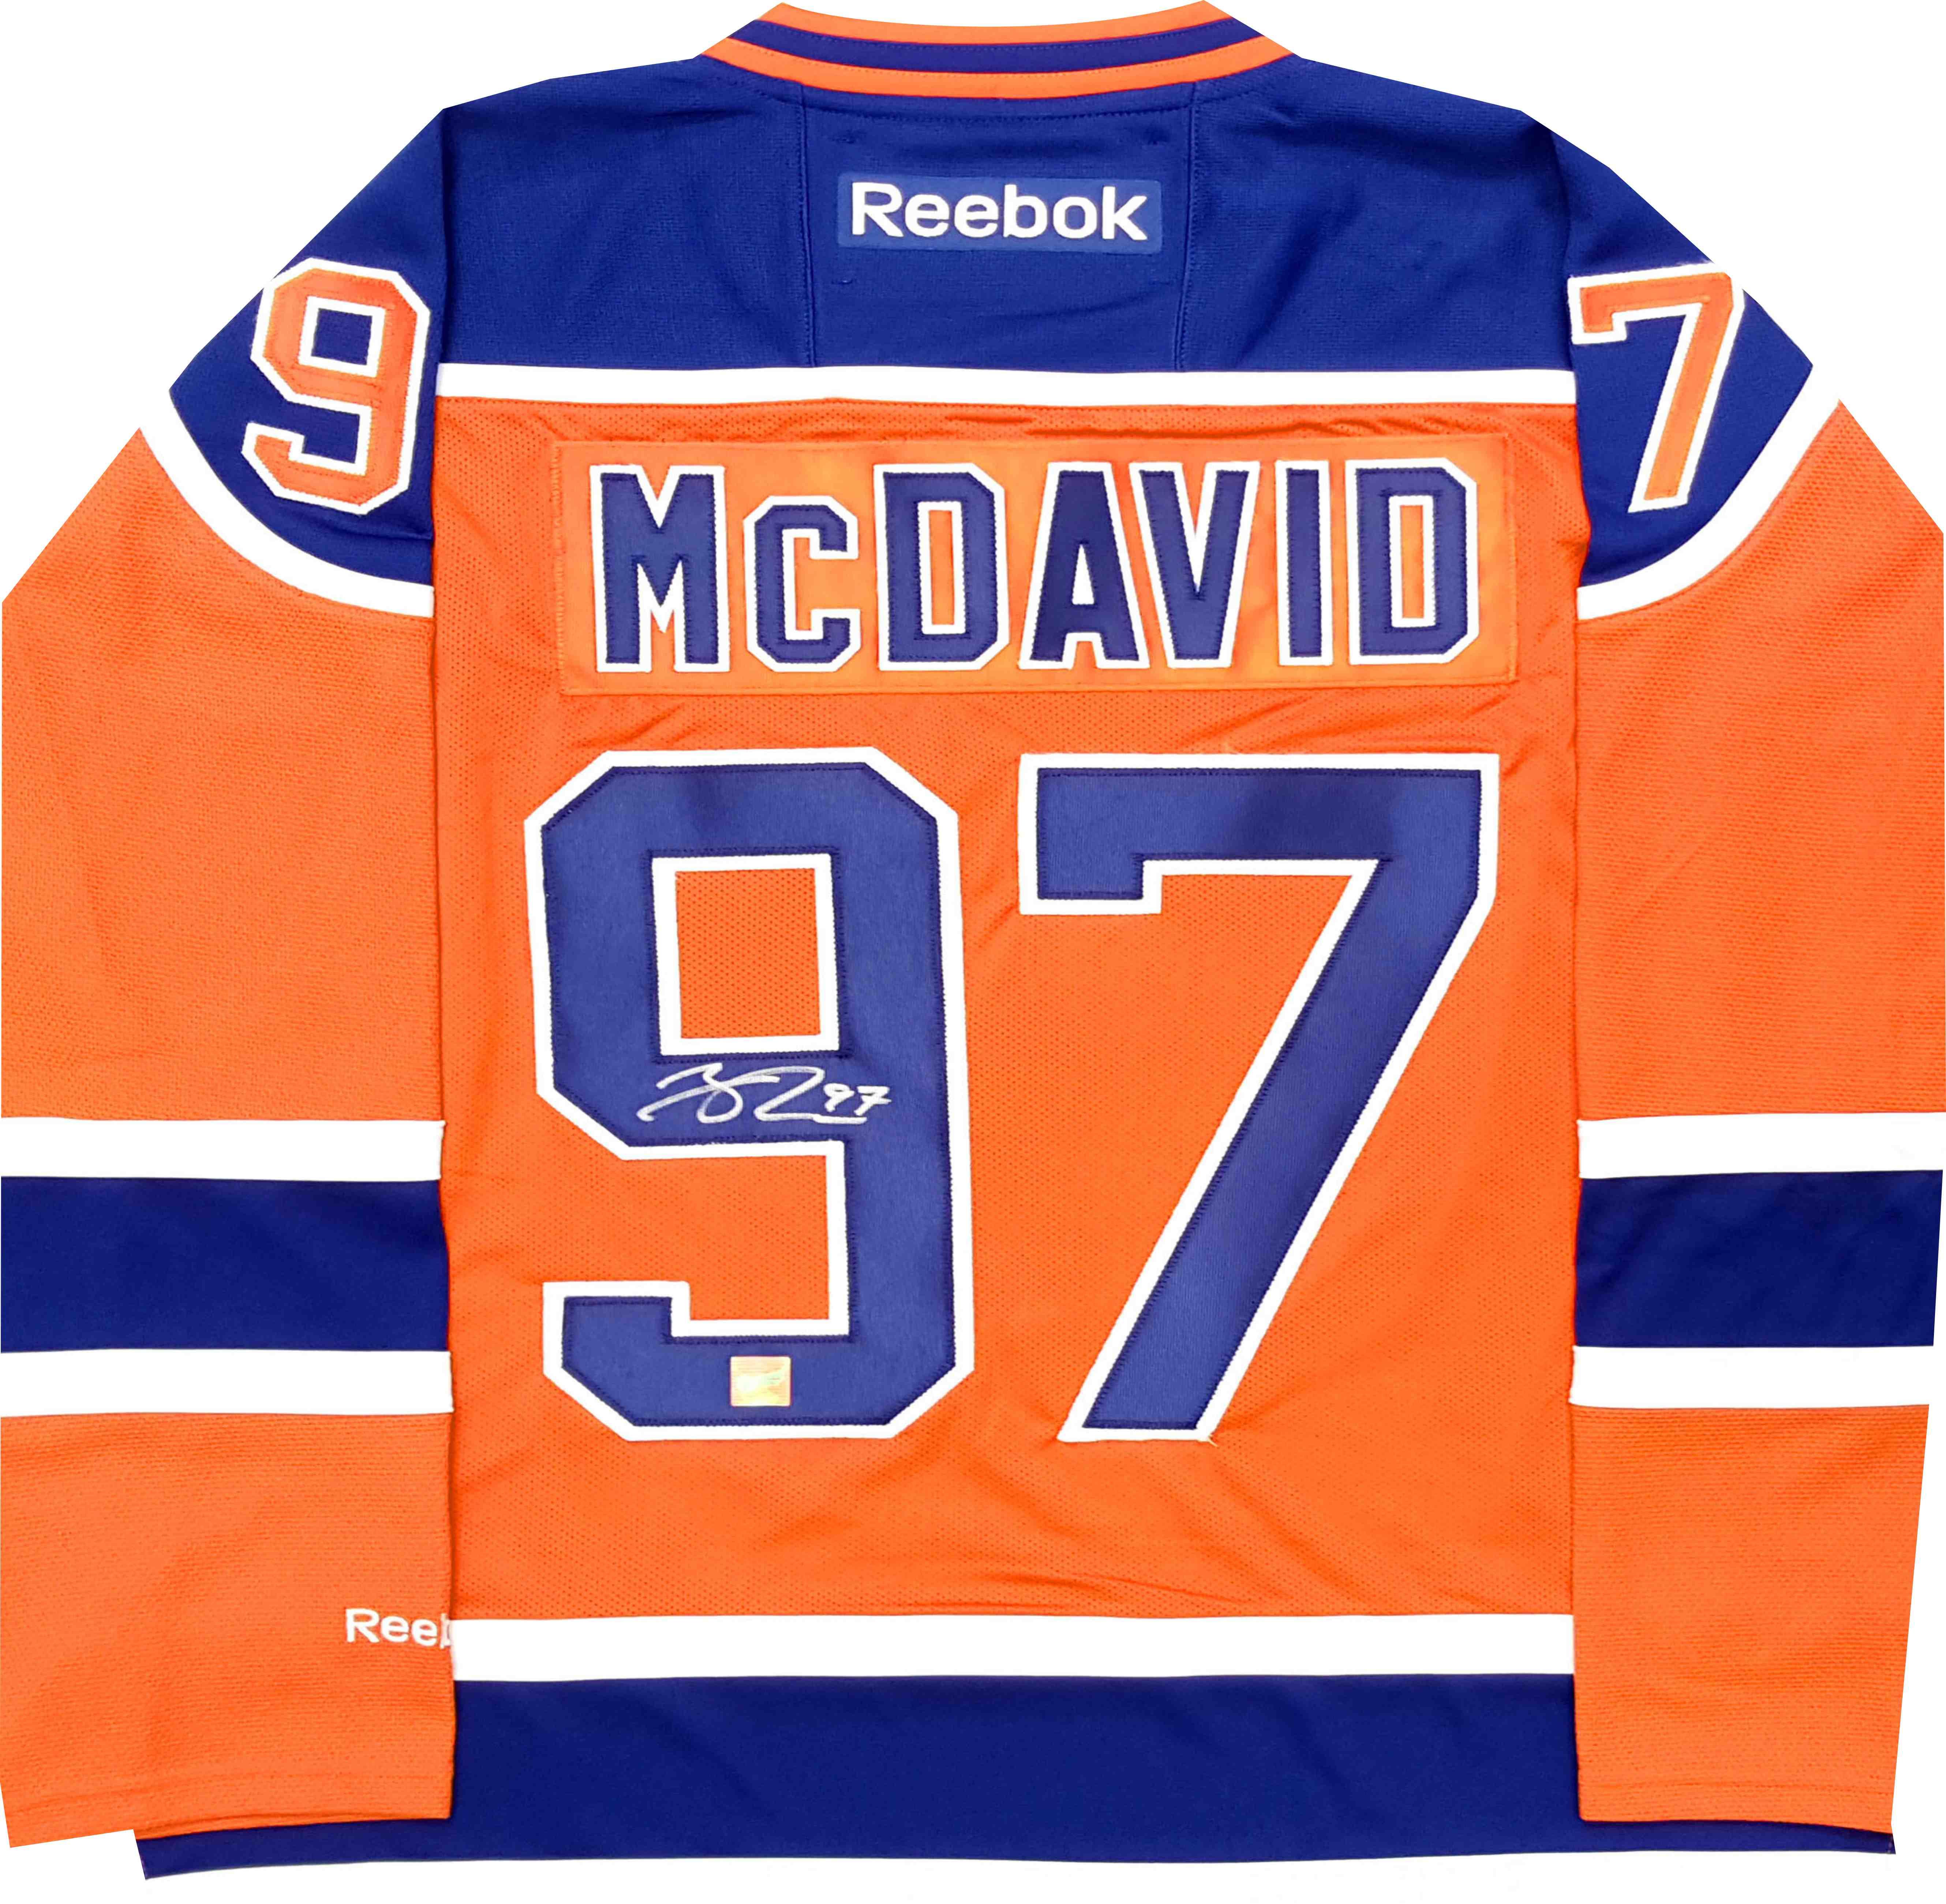 super popular 70110 7f344 Lot Detail - Connor McDavid - Signed Edmonton Oilers Replica ...